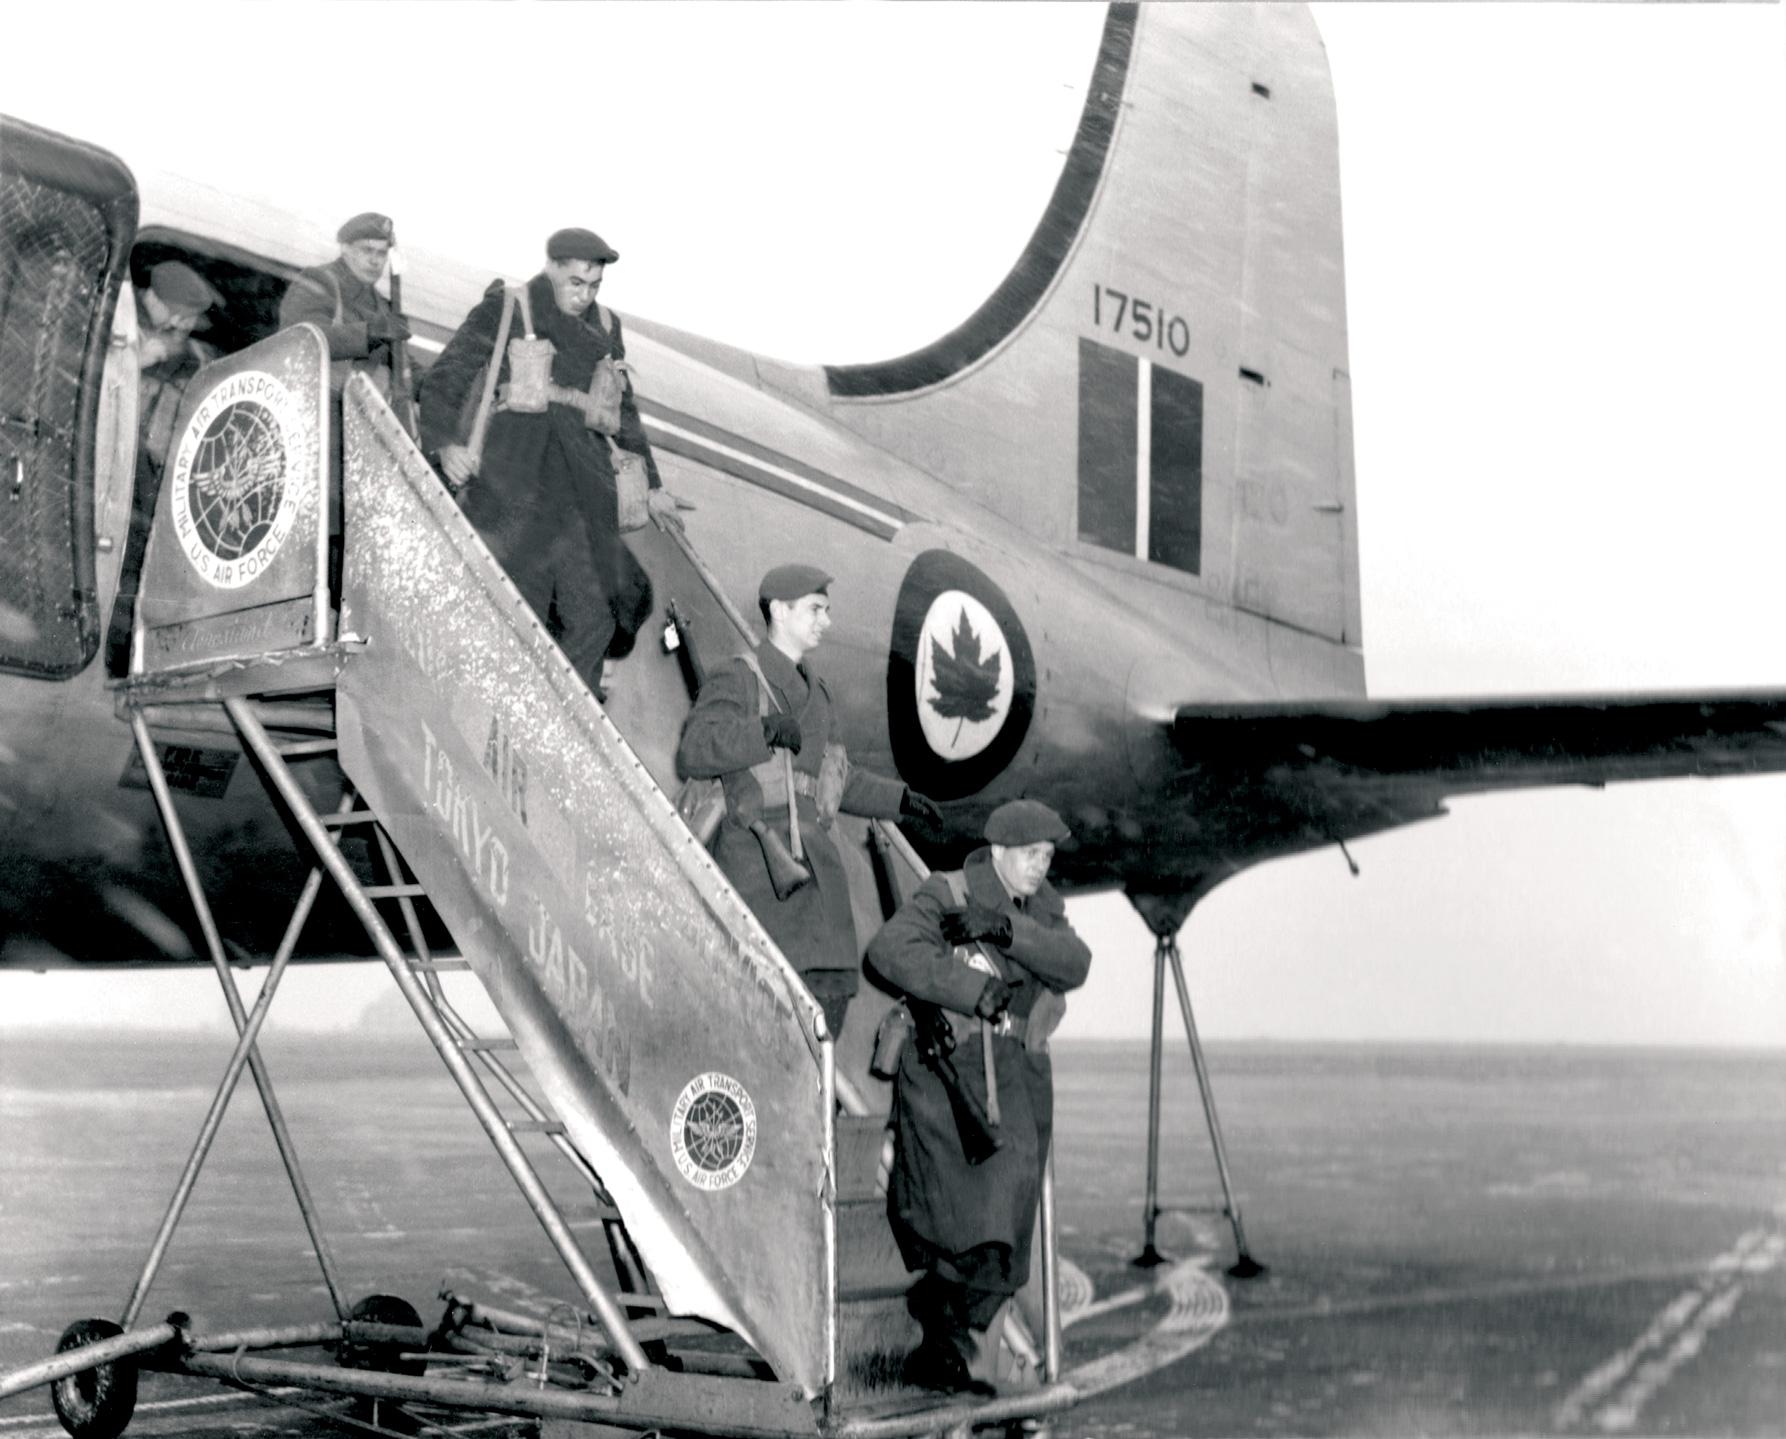 Historic Korean War Photo – Canadian Troops Disembark